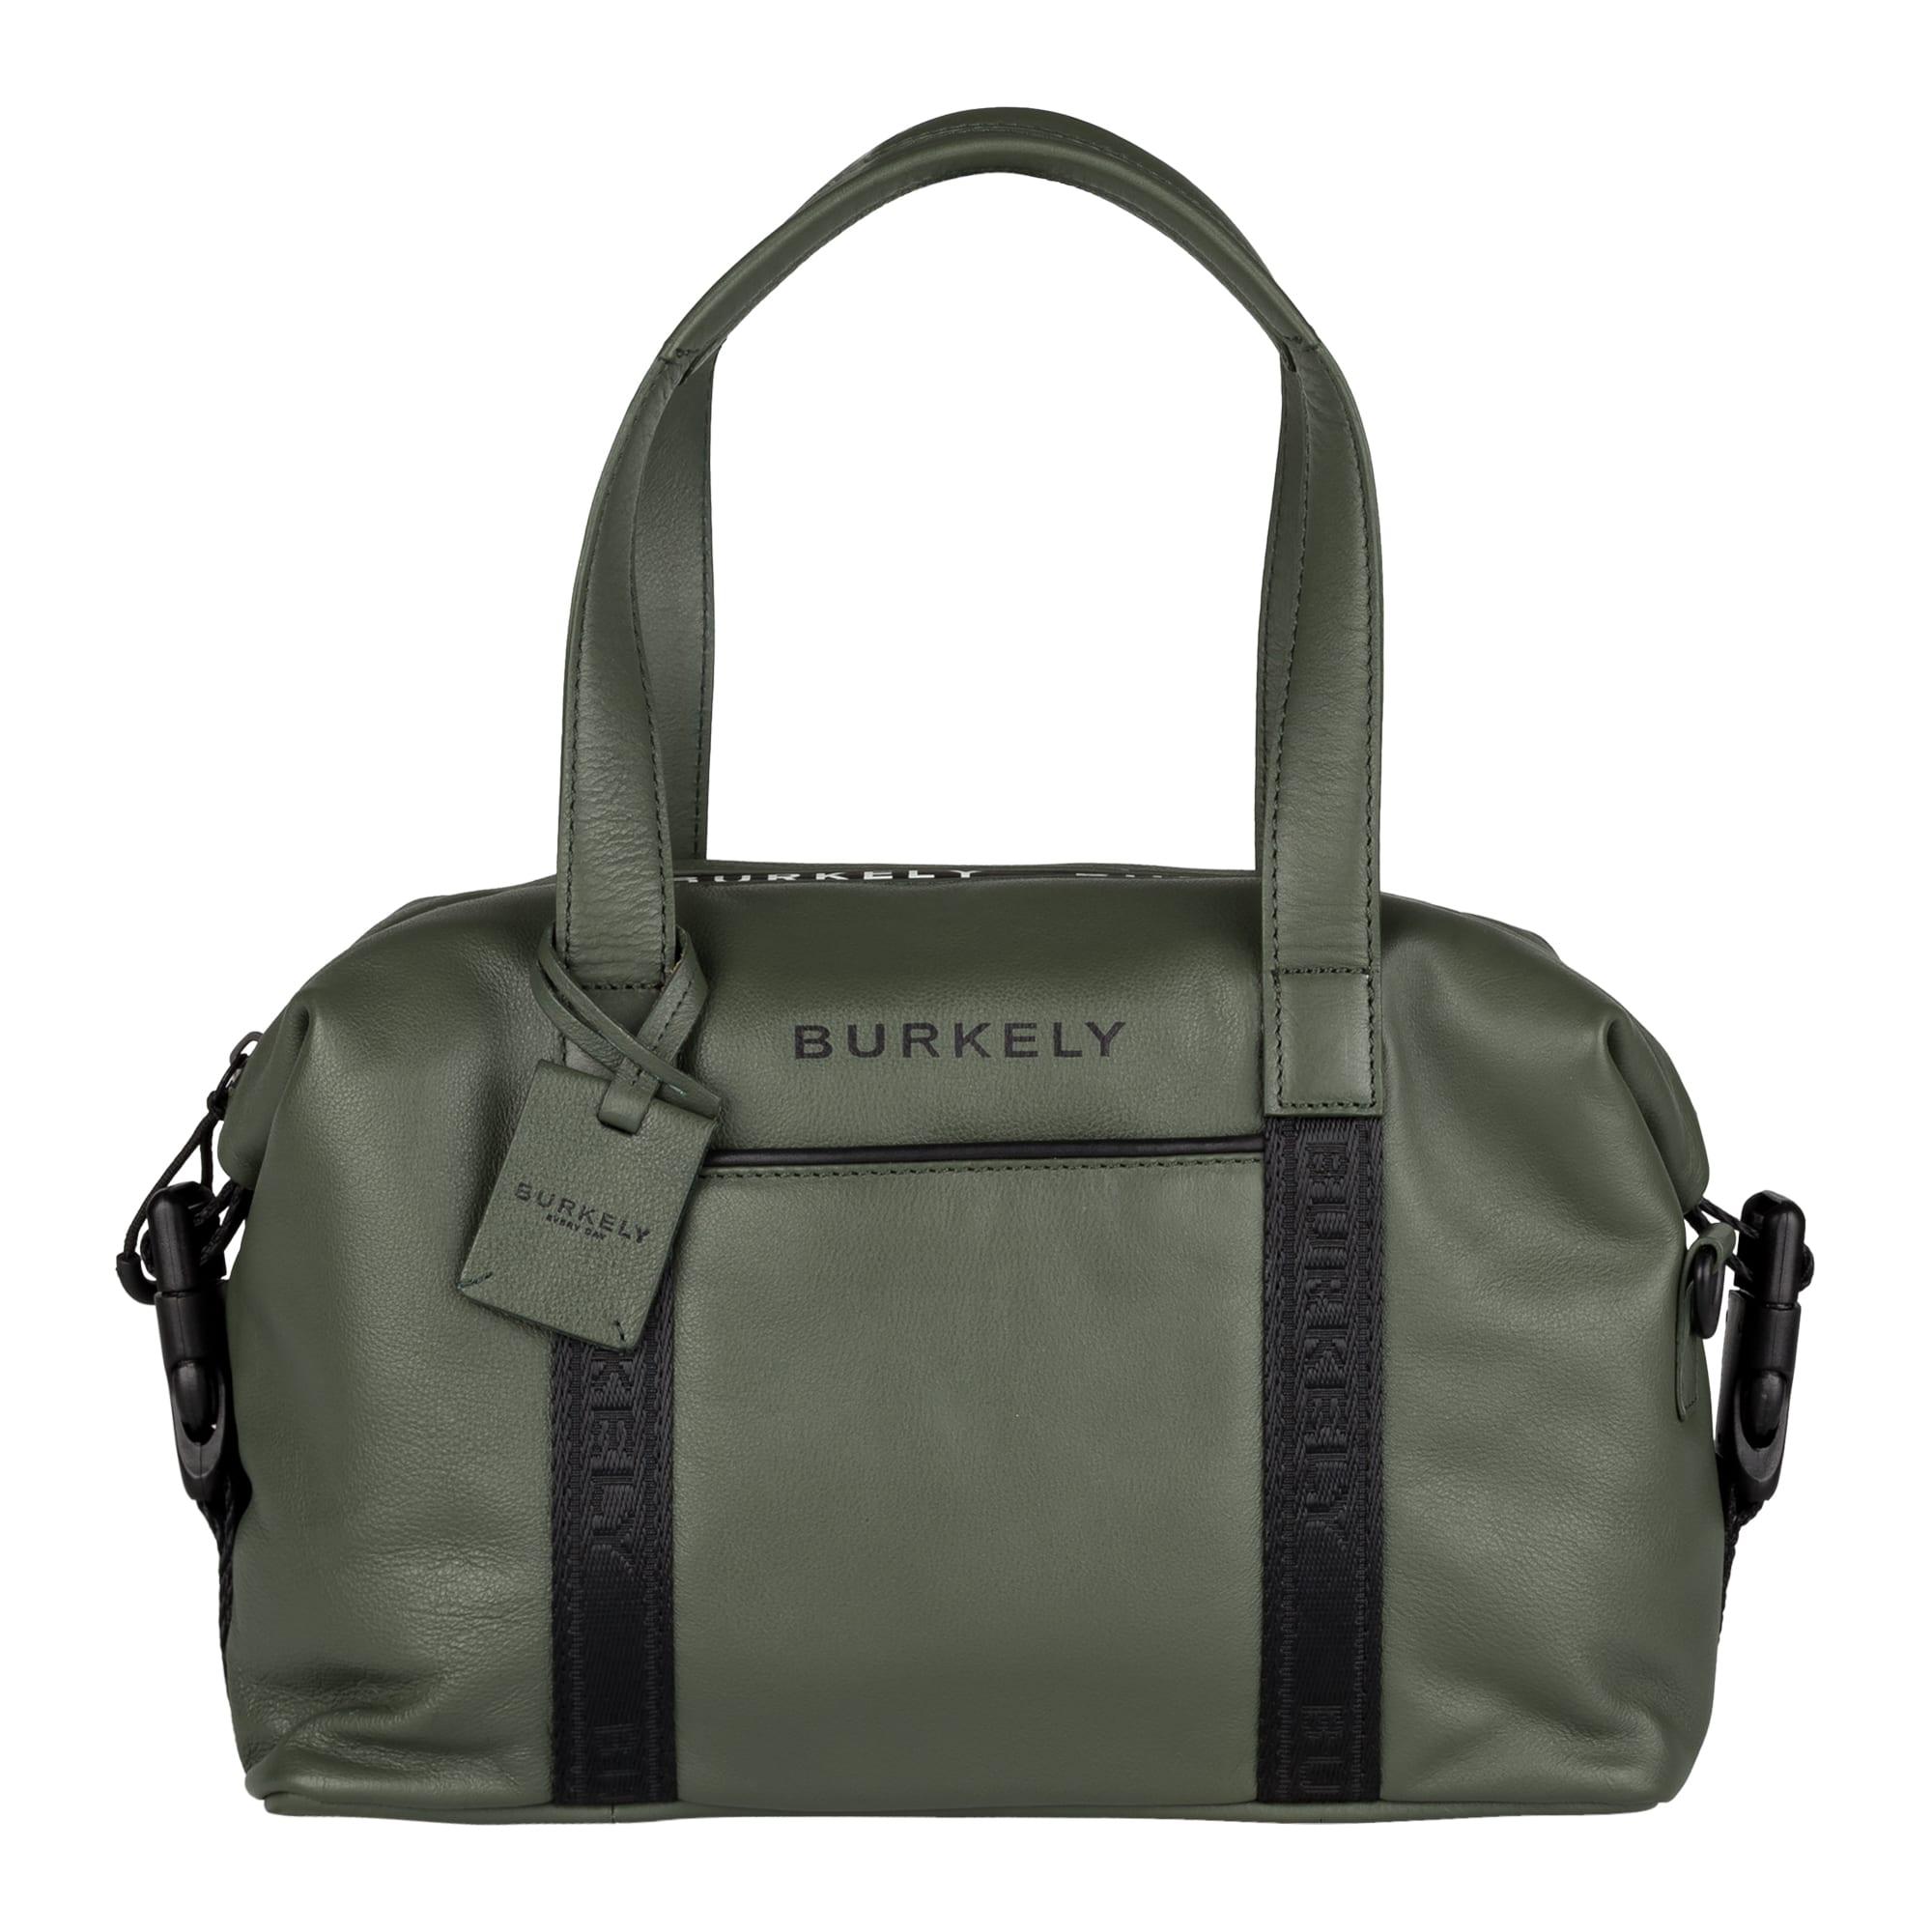 Burkely Rebel Reese Small Handbag Green-0